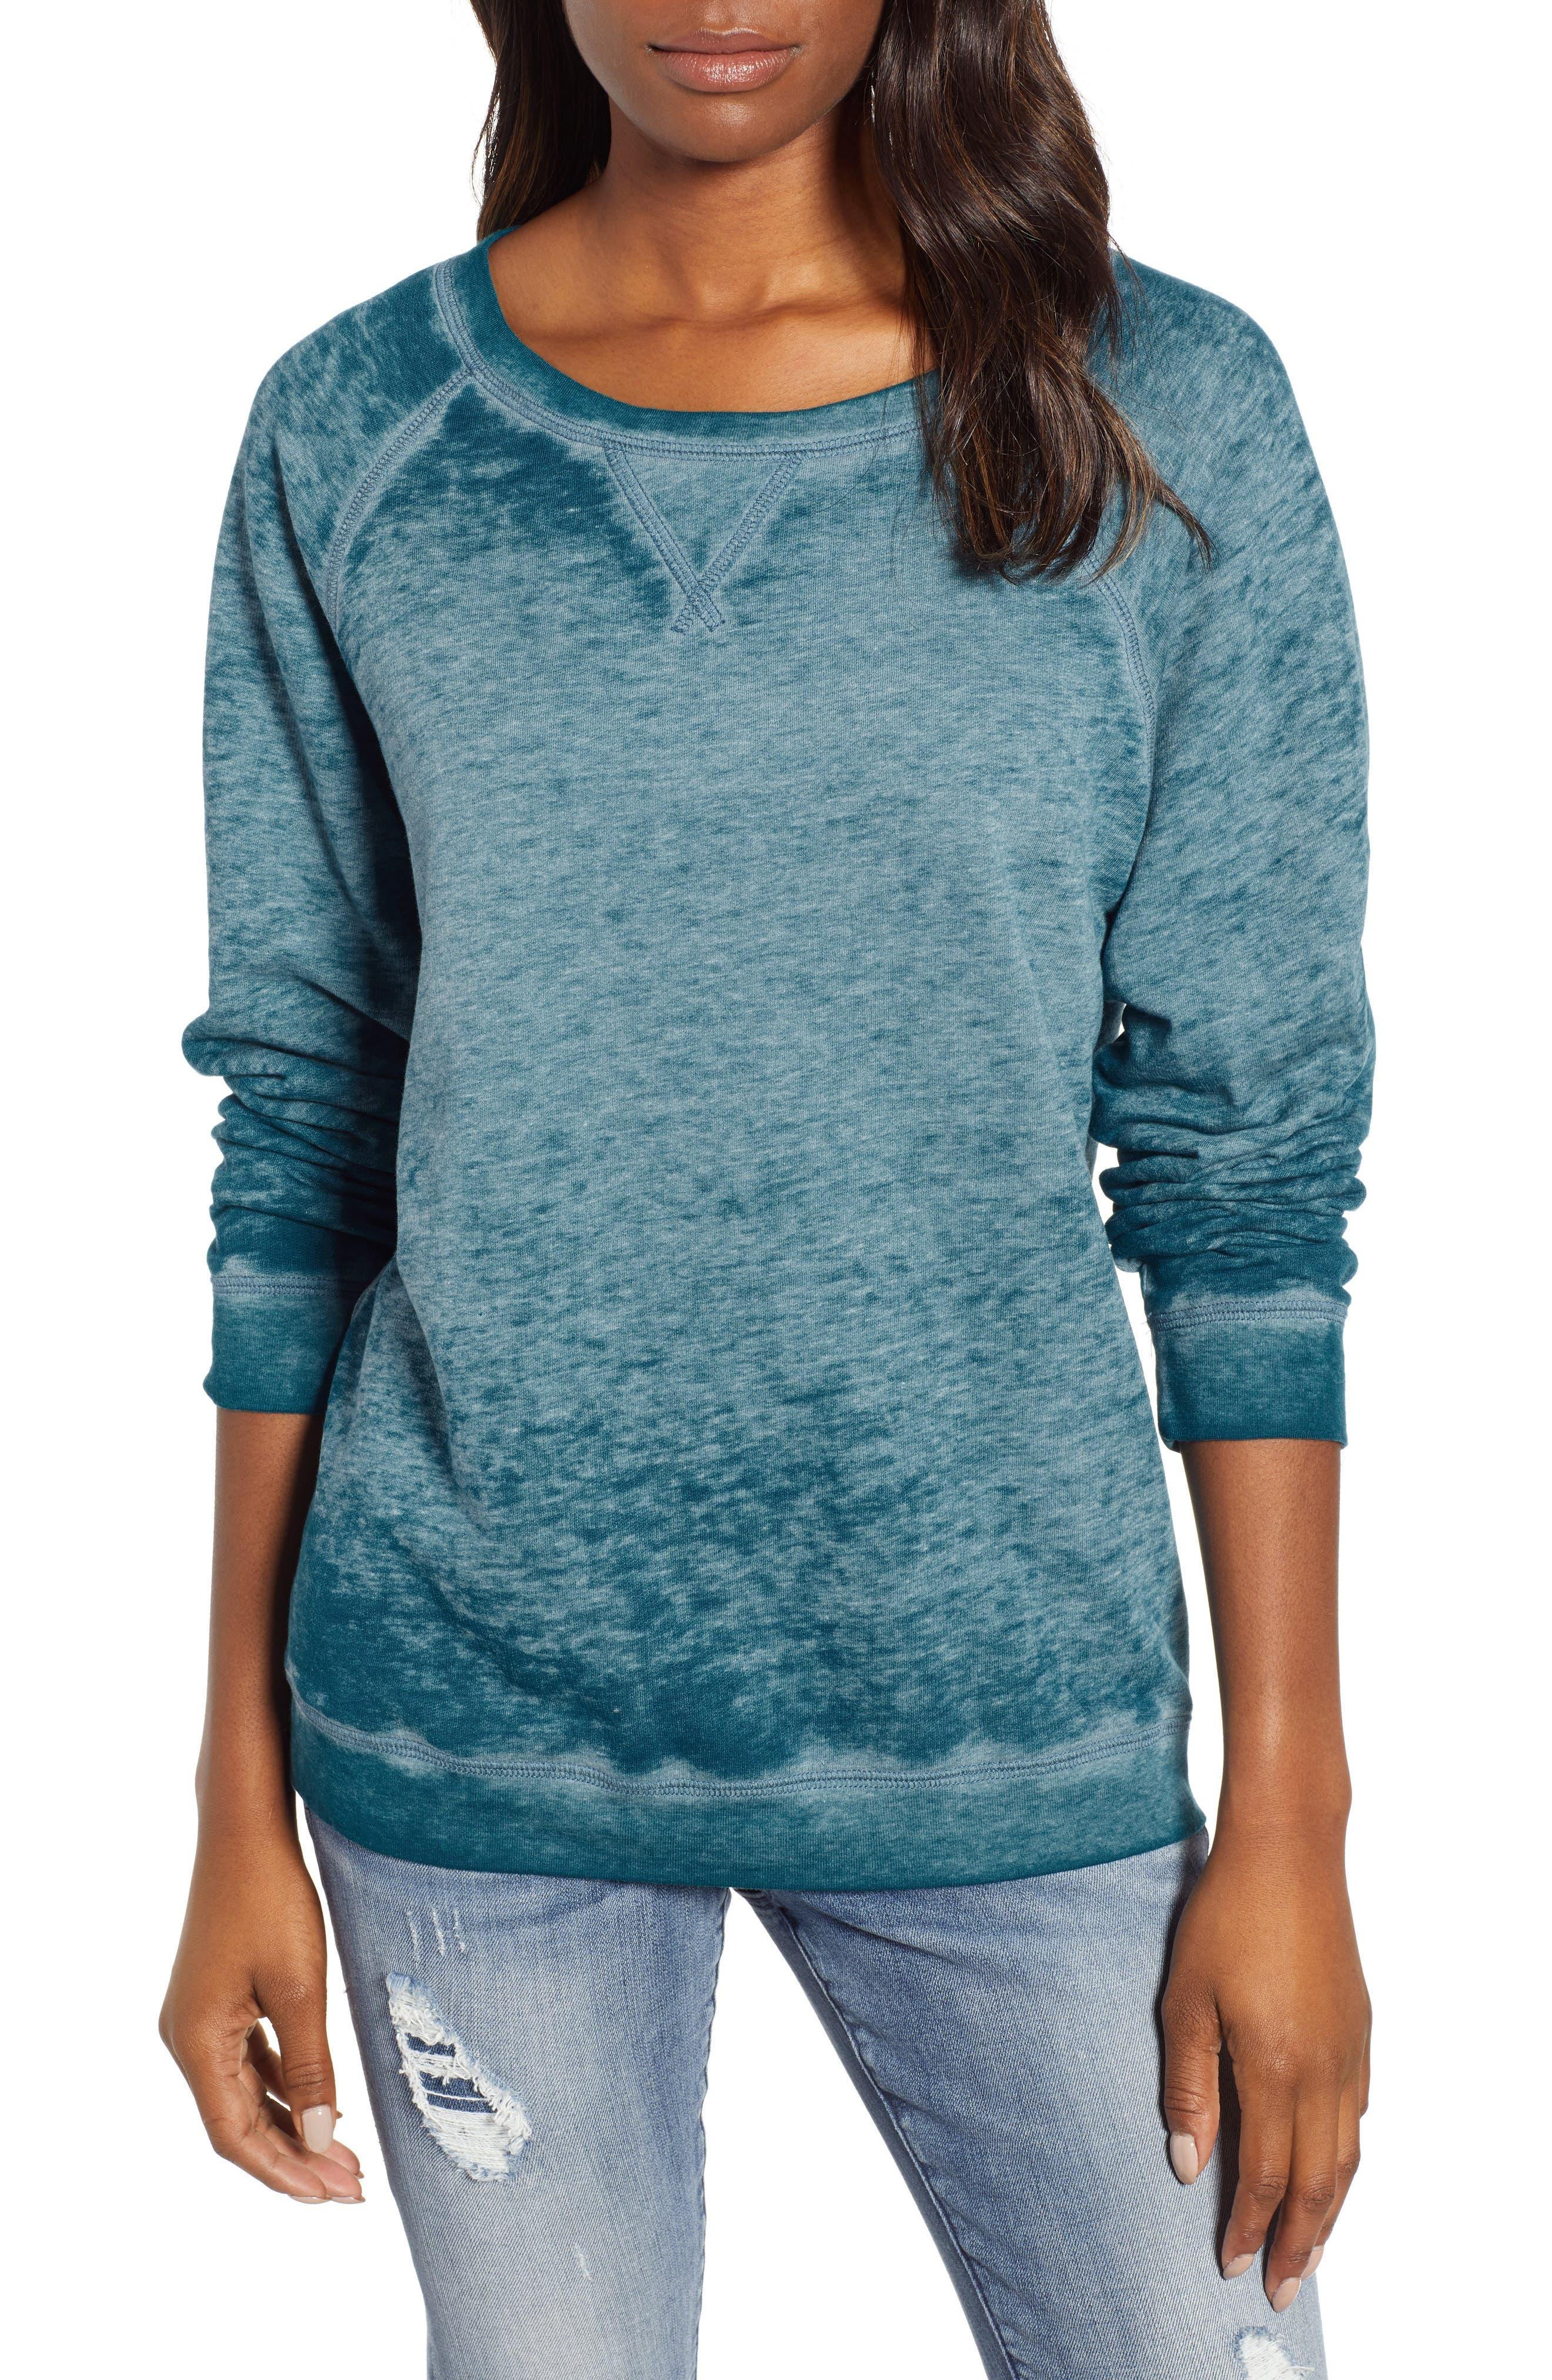 Burnout Sweatshirt,                             Main thumbnail 1, color,                             TEAL CORAL